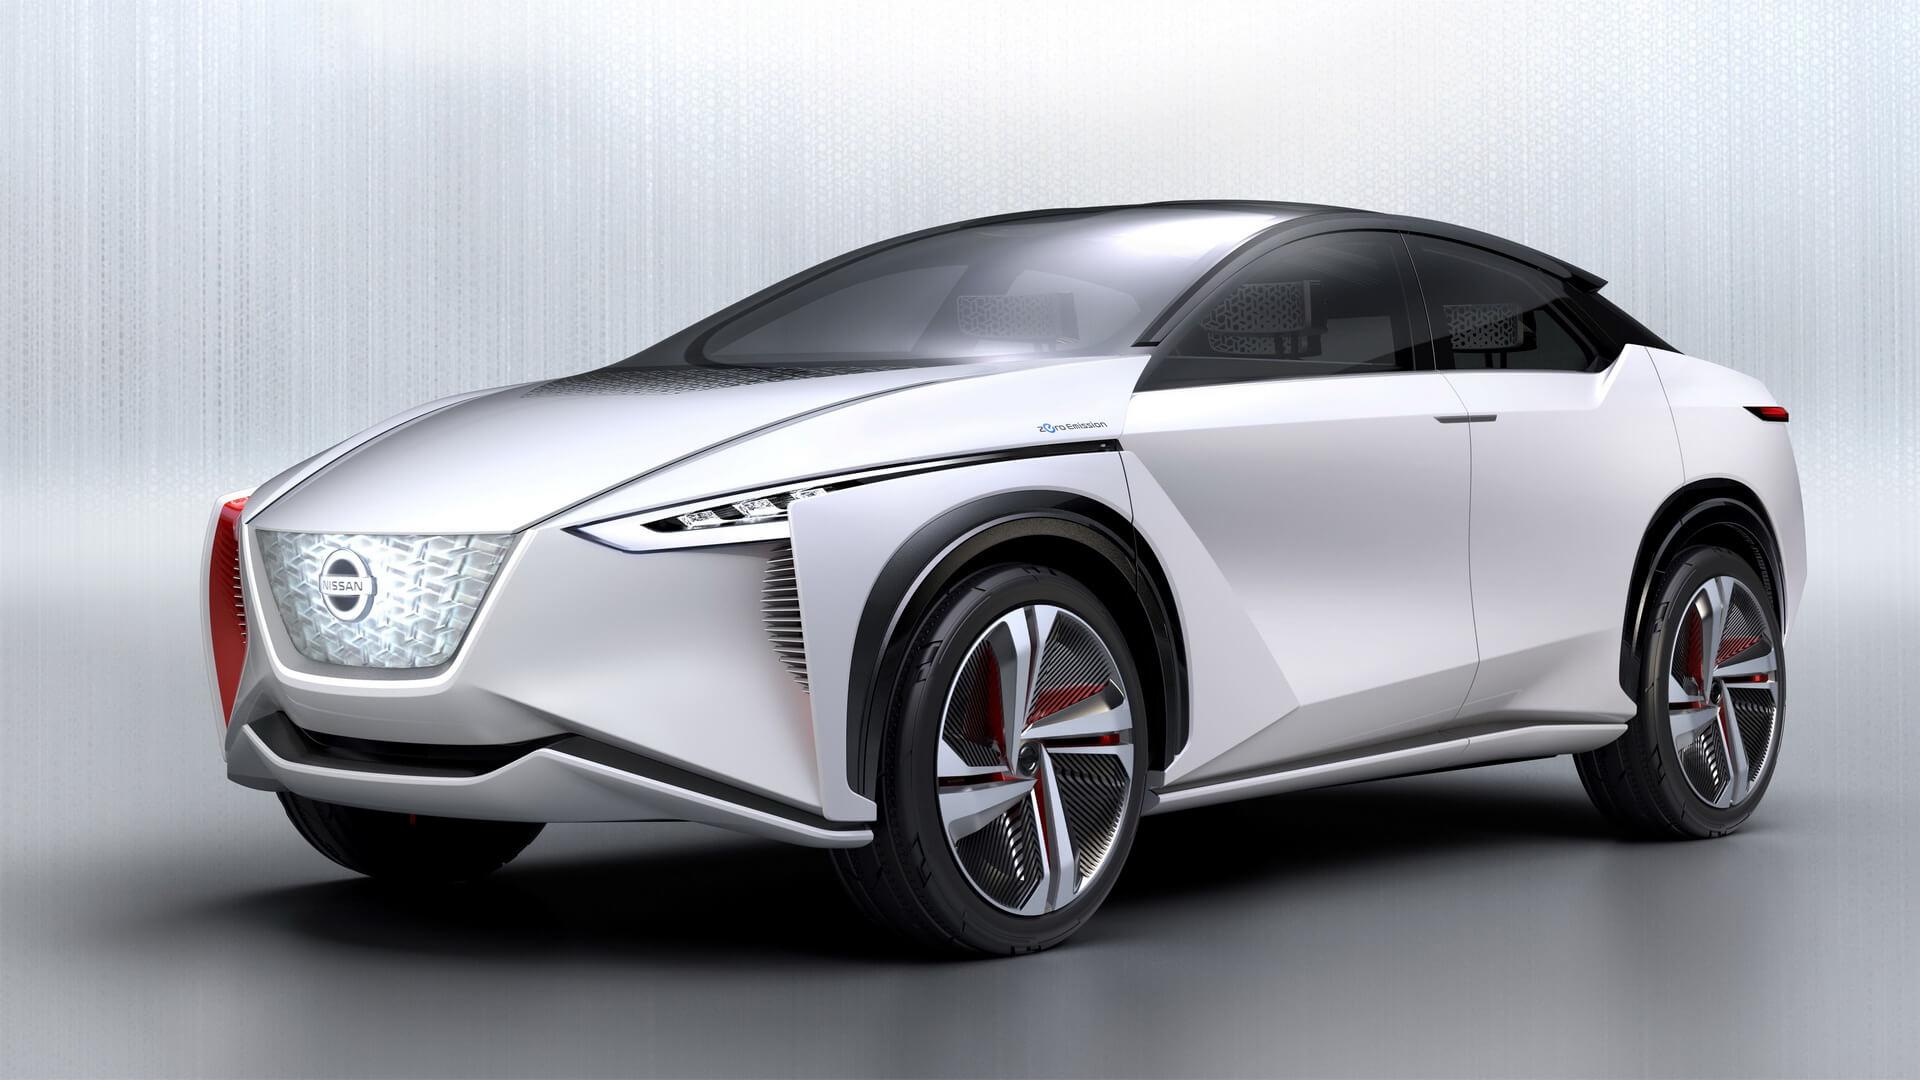 Концептуальный электромобиль Nissan IMx